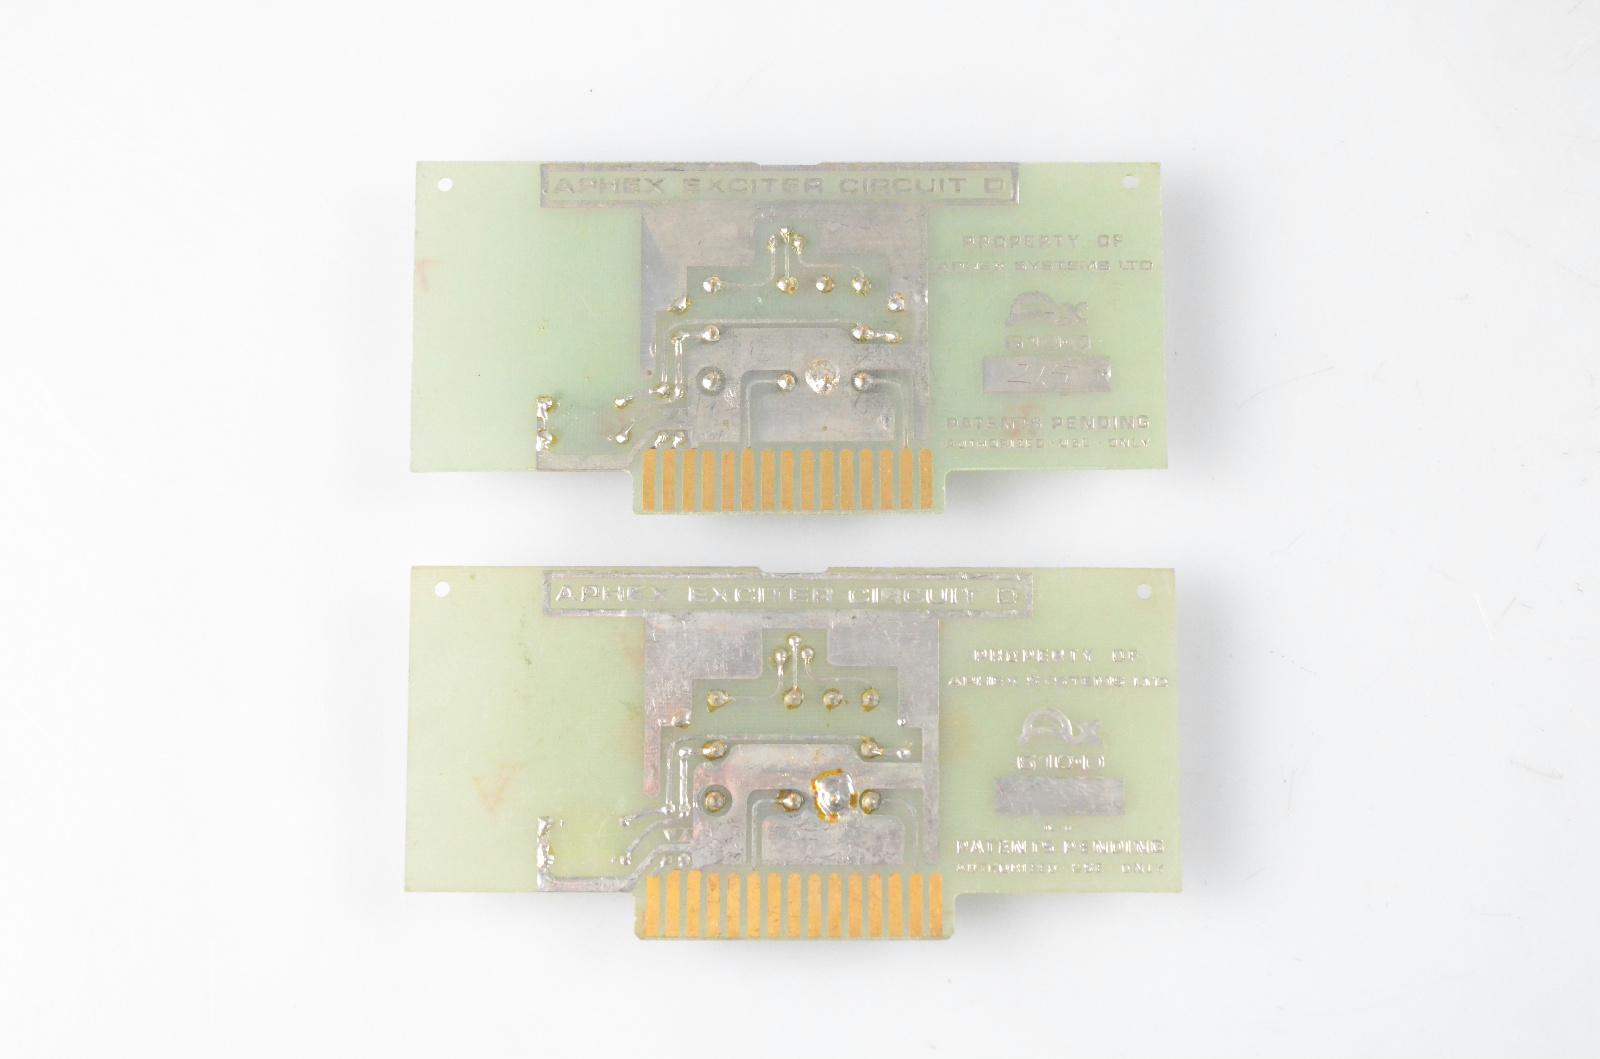 2 Aphex AX 610D Circuit D Boards for Vintage Aural Exciter 402 602 602B #32623